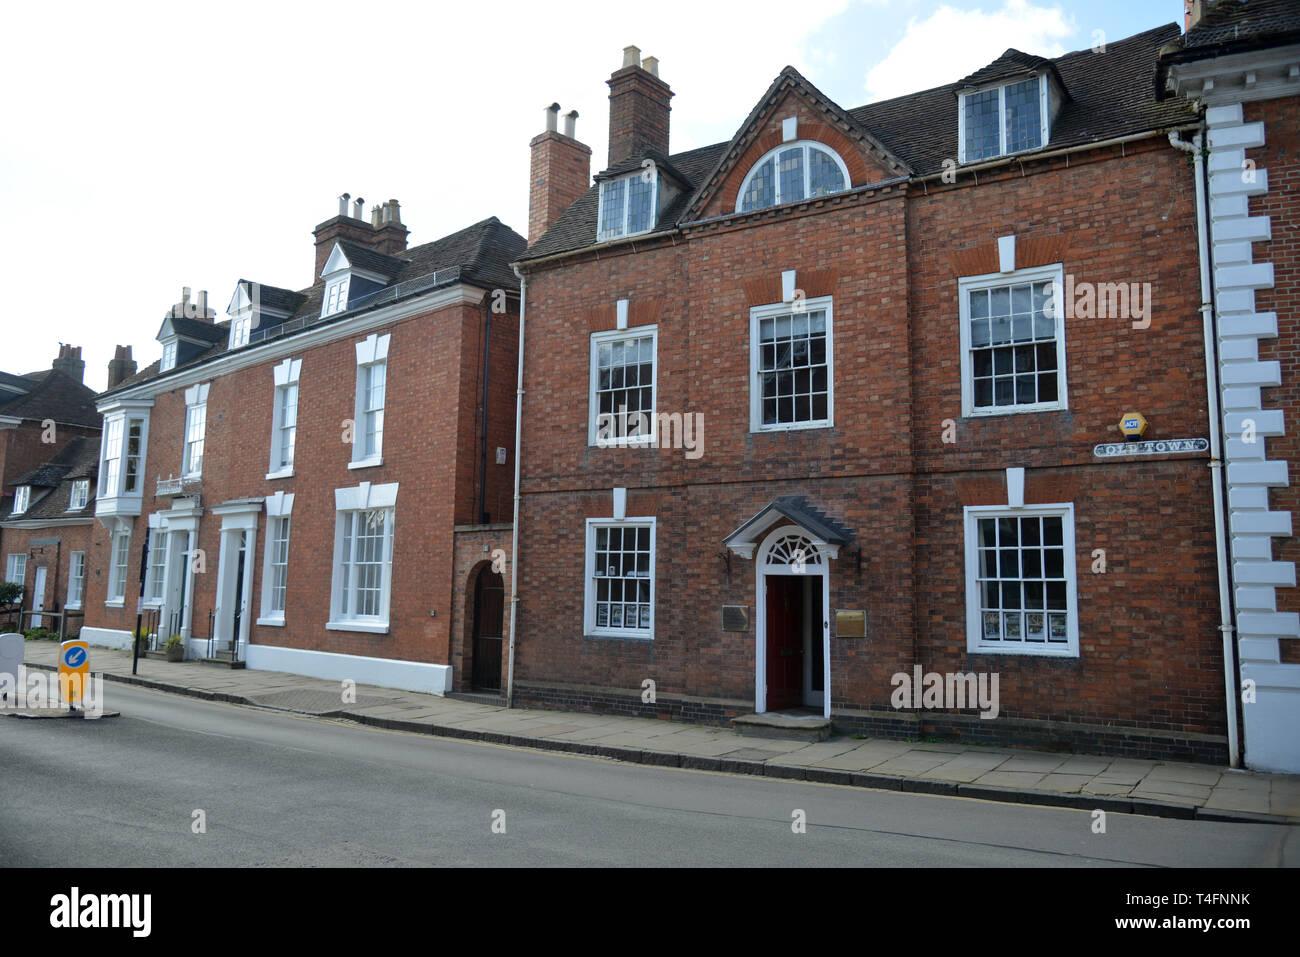 Properites on Old Town Stratford Upon Avon, Warwickshire Stock Photo